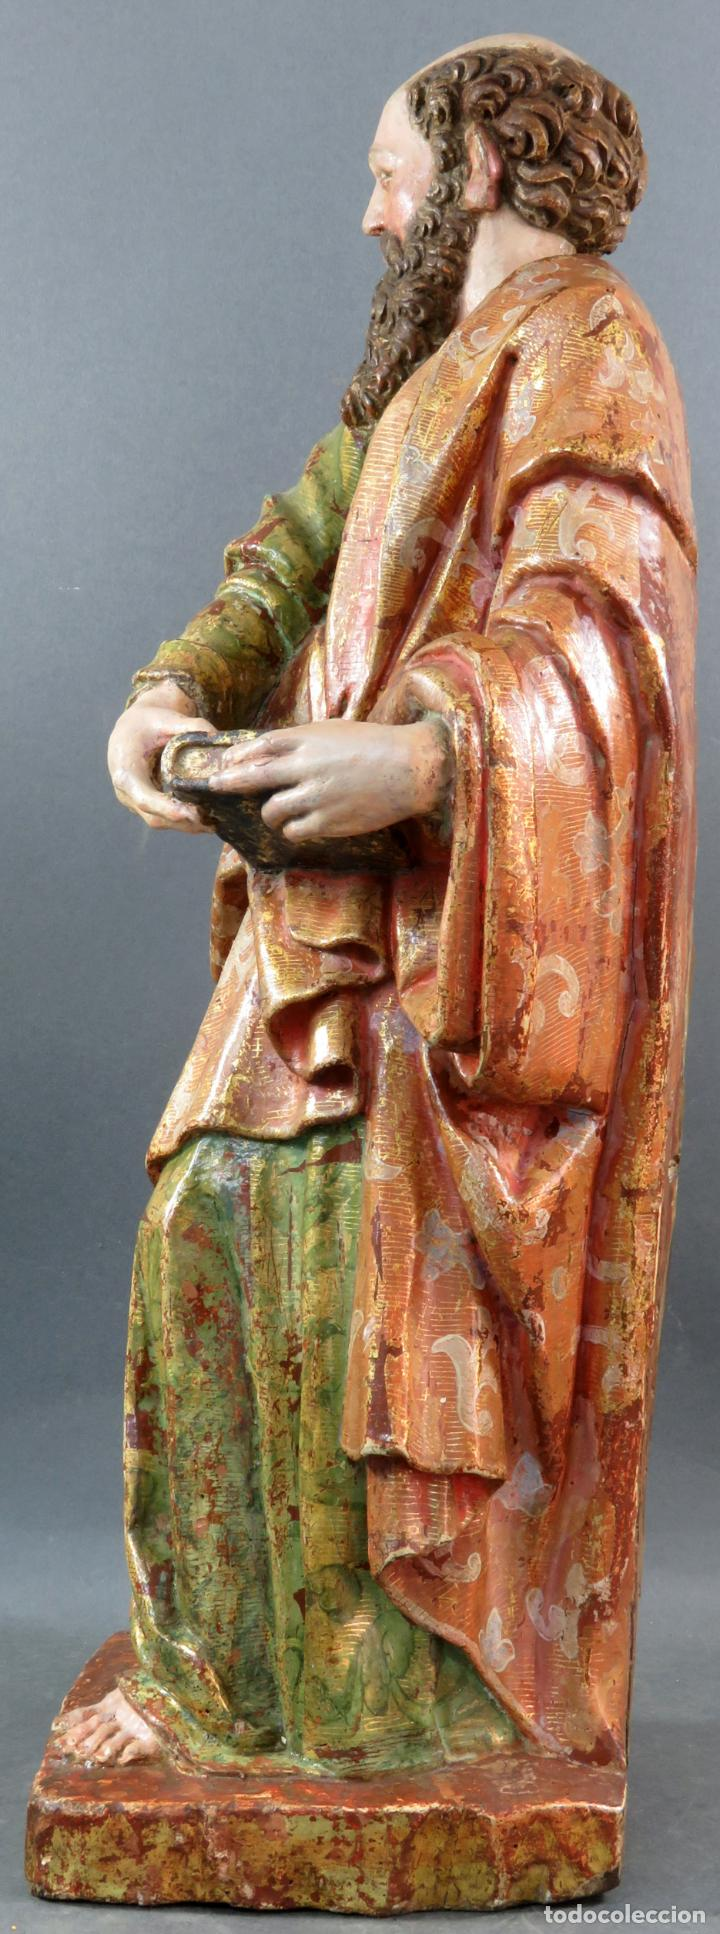 Arte: Talla San Pablo en madera estofada dorada policromada seguidor Gregorio Fernández siglo XVI - Foto 12 - 159655670